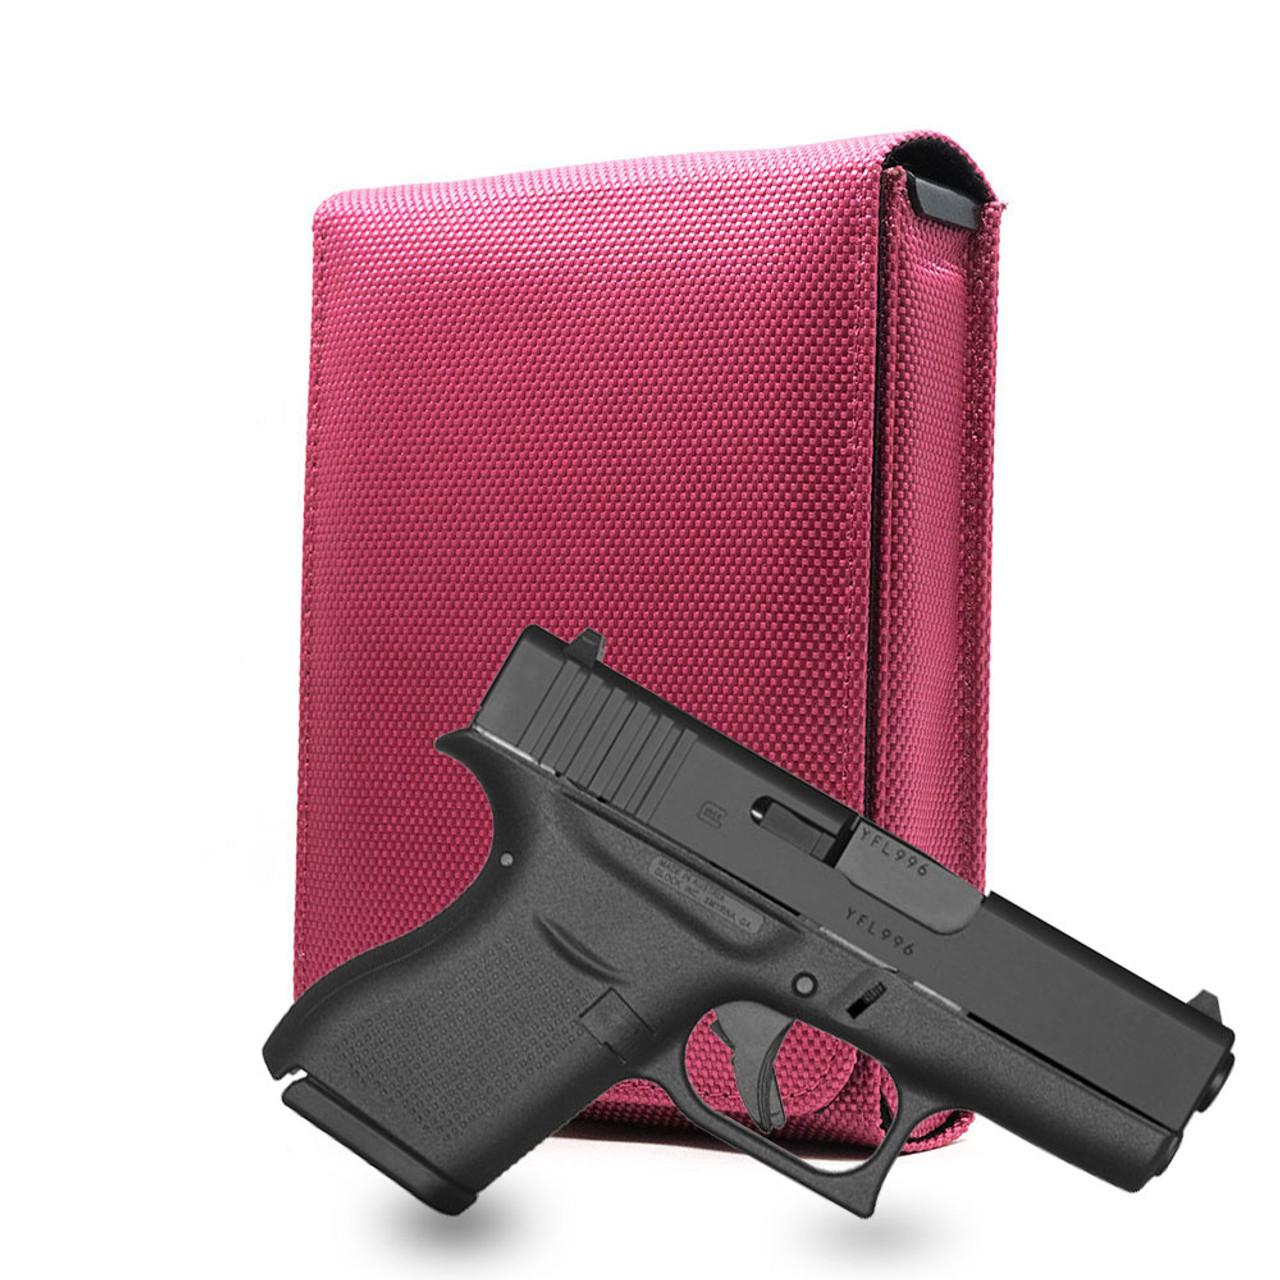 Glock 43 Pink Covert Series Holster